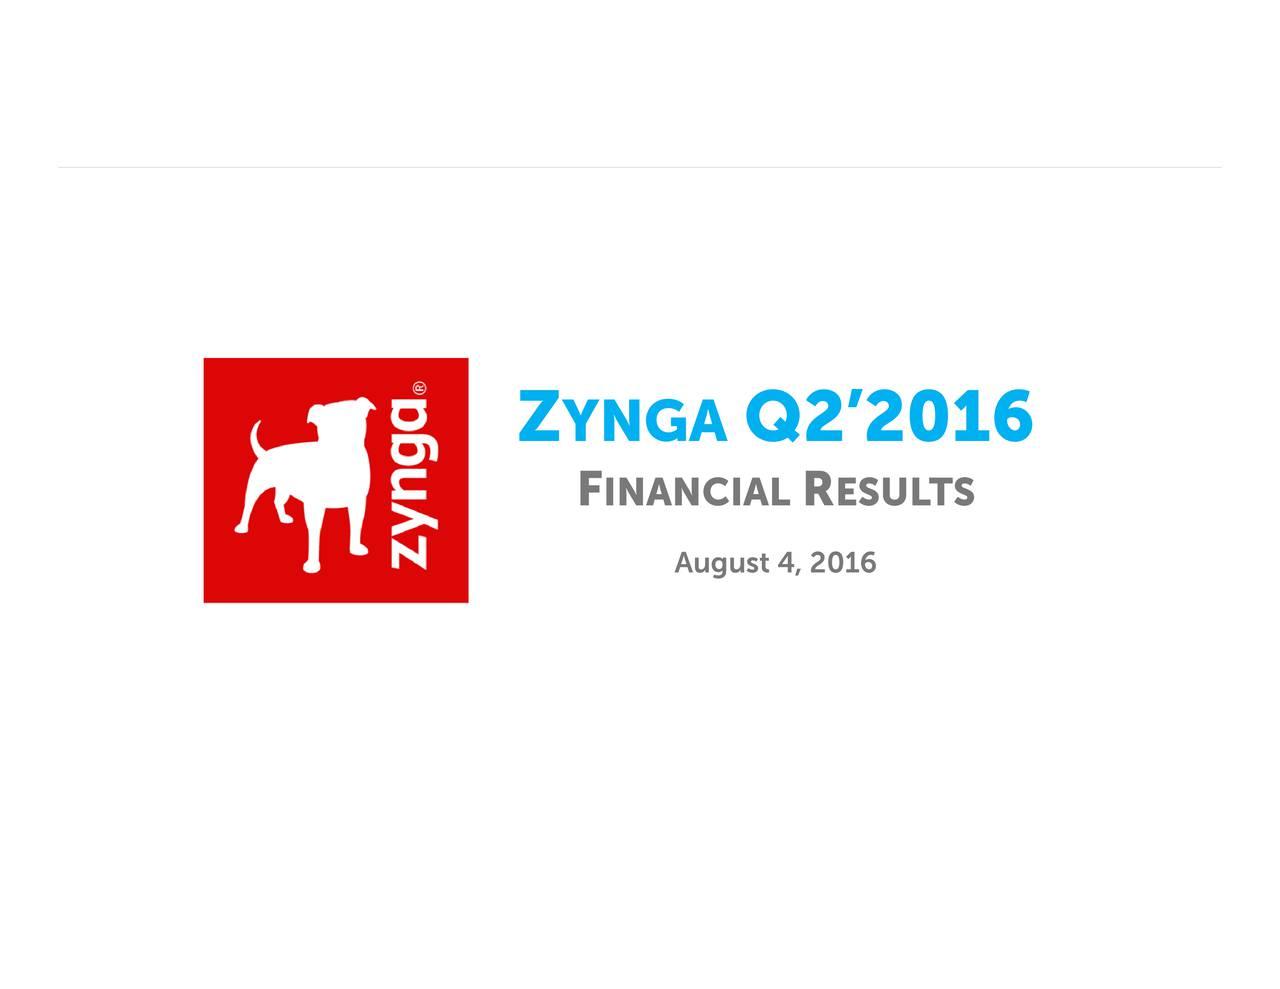 Q22016 August 4, 2016 INANCIAL YNGA Z